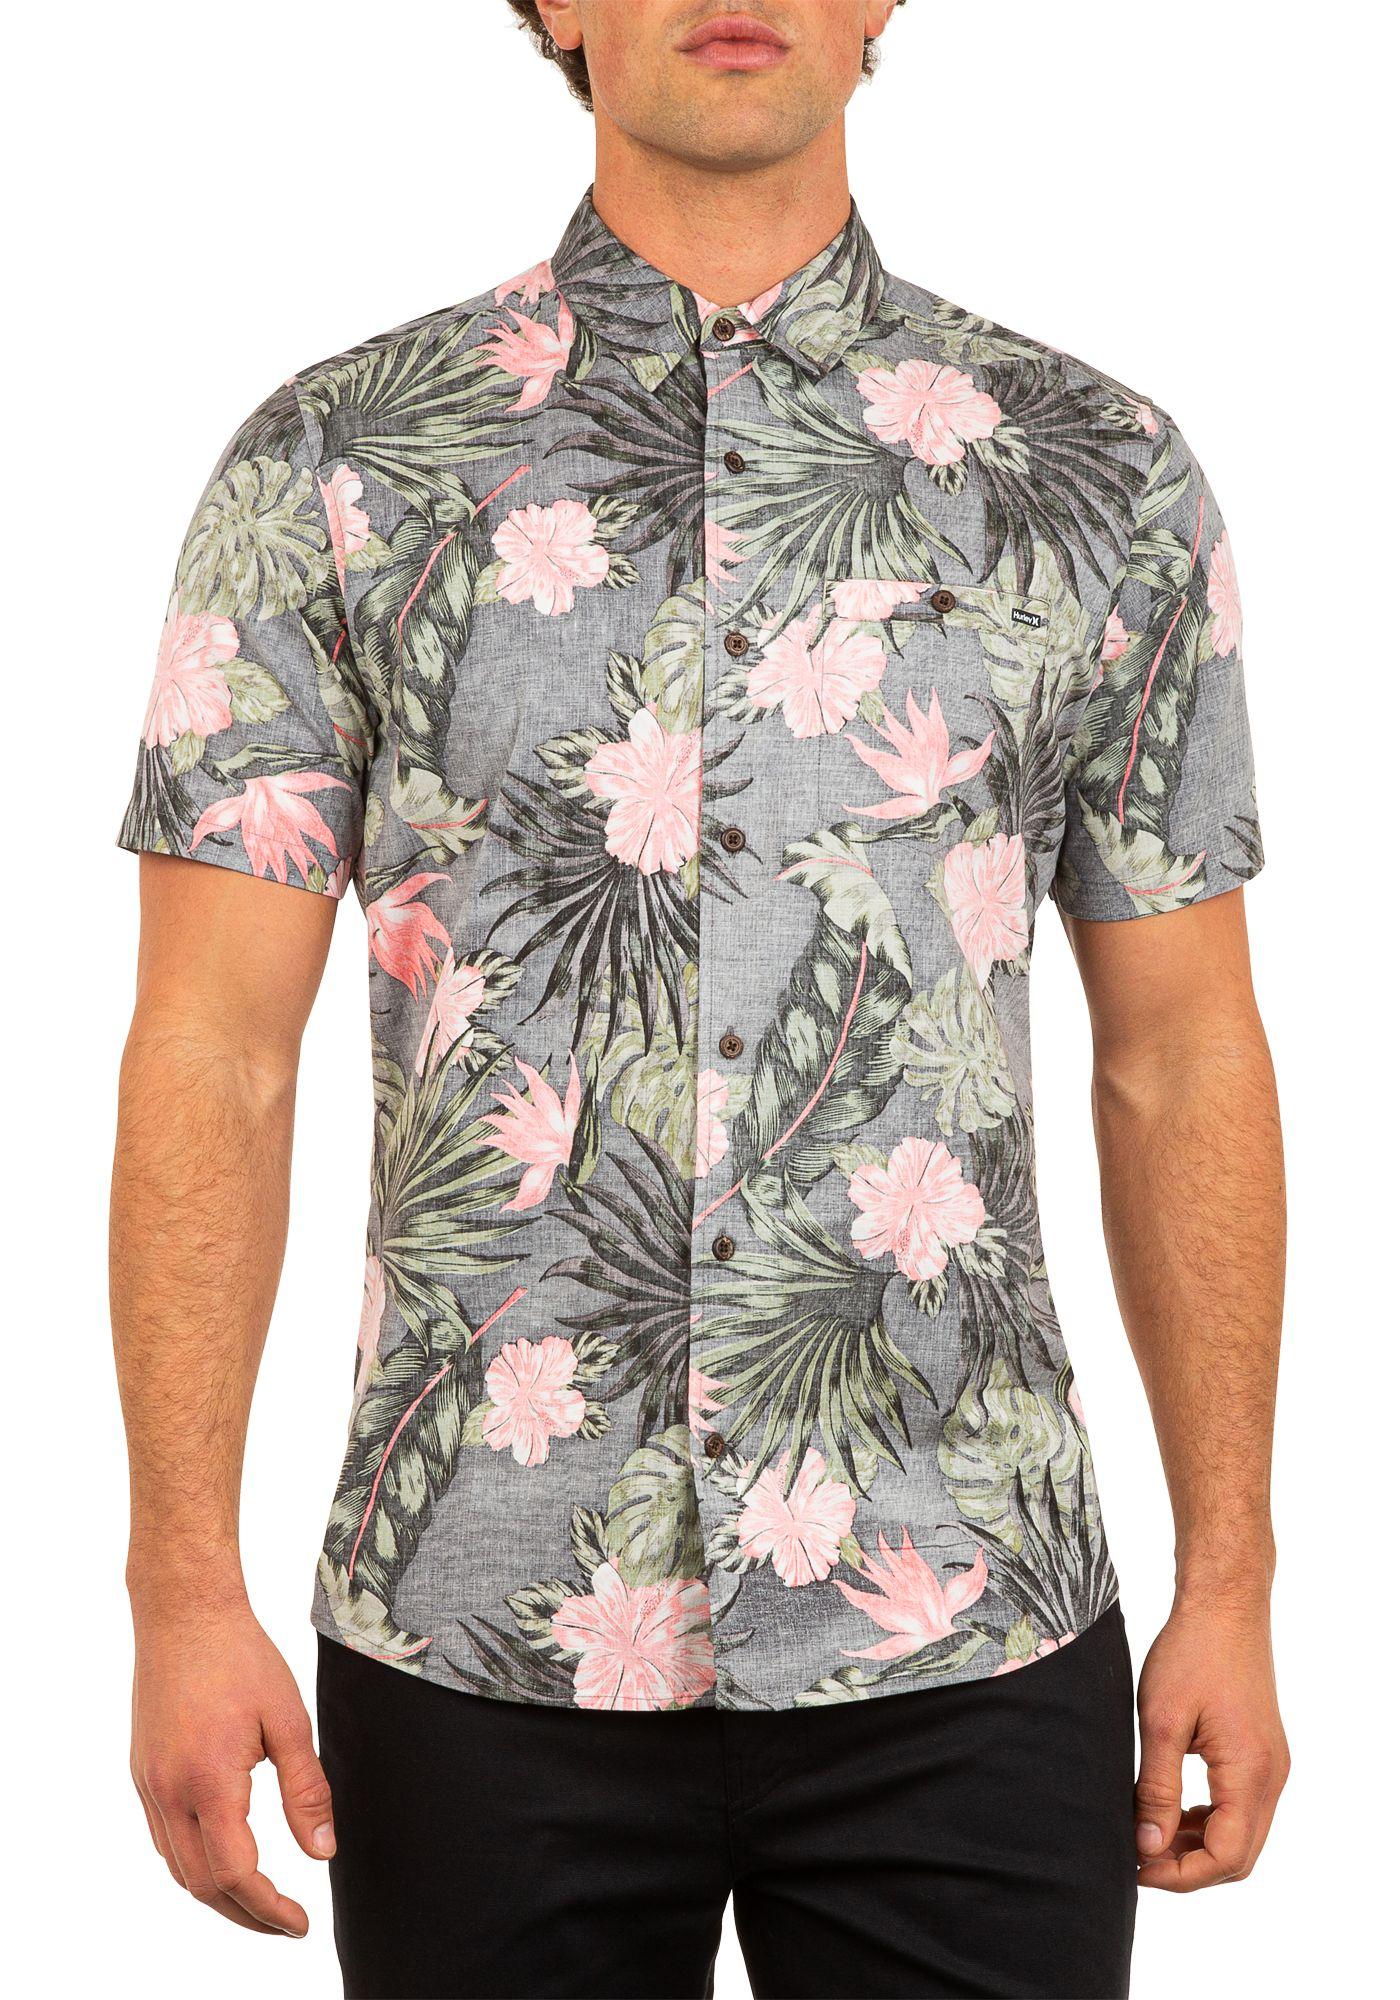 Hurley Men's Lanai Stretch Reverse Woven Short Sleeve Shirt